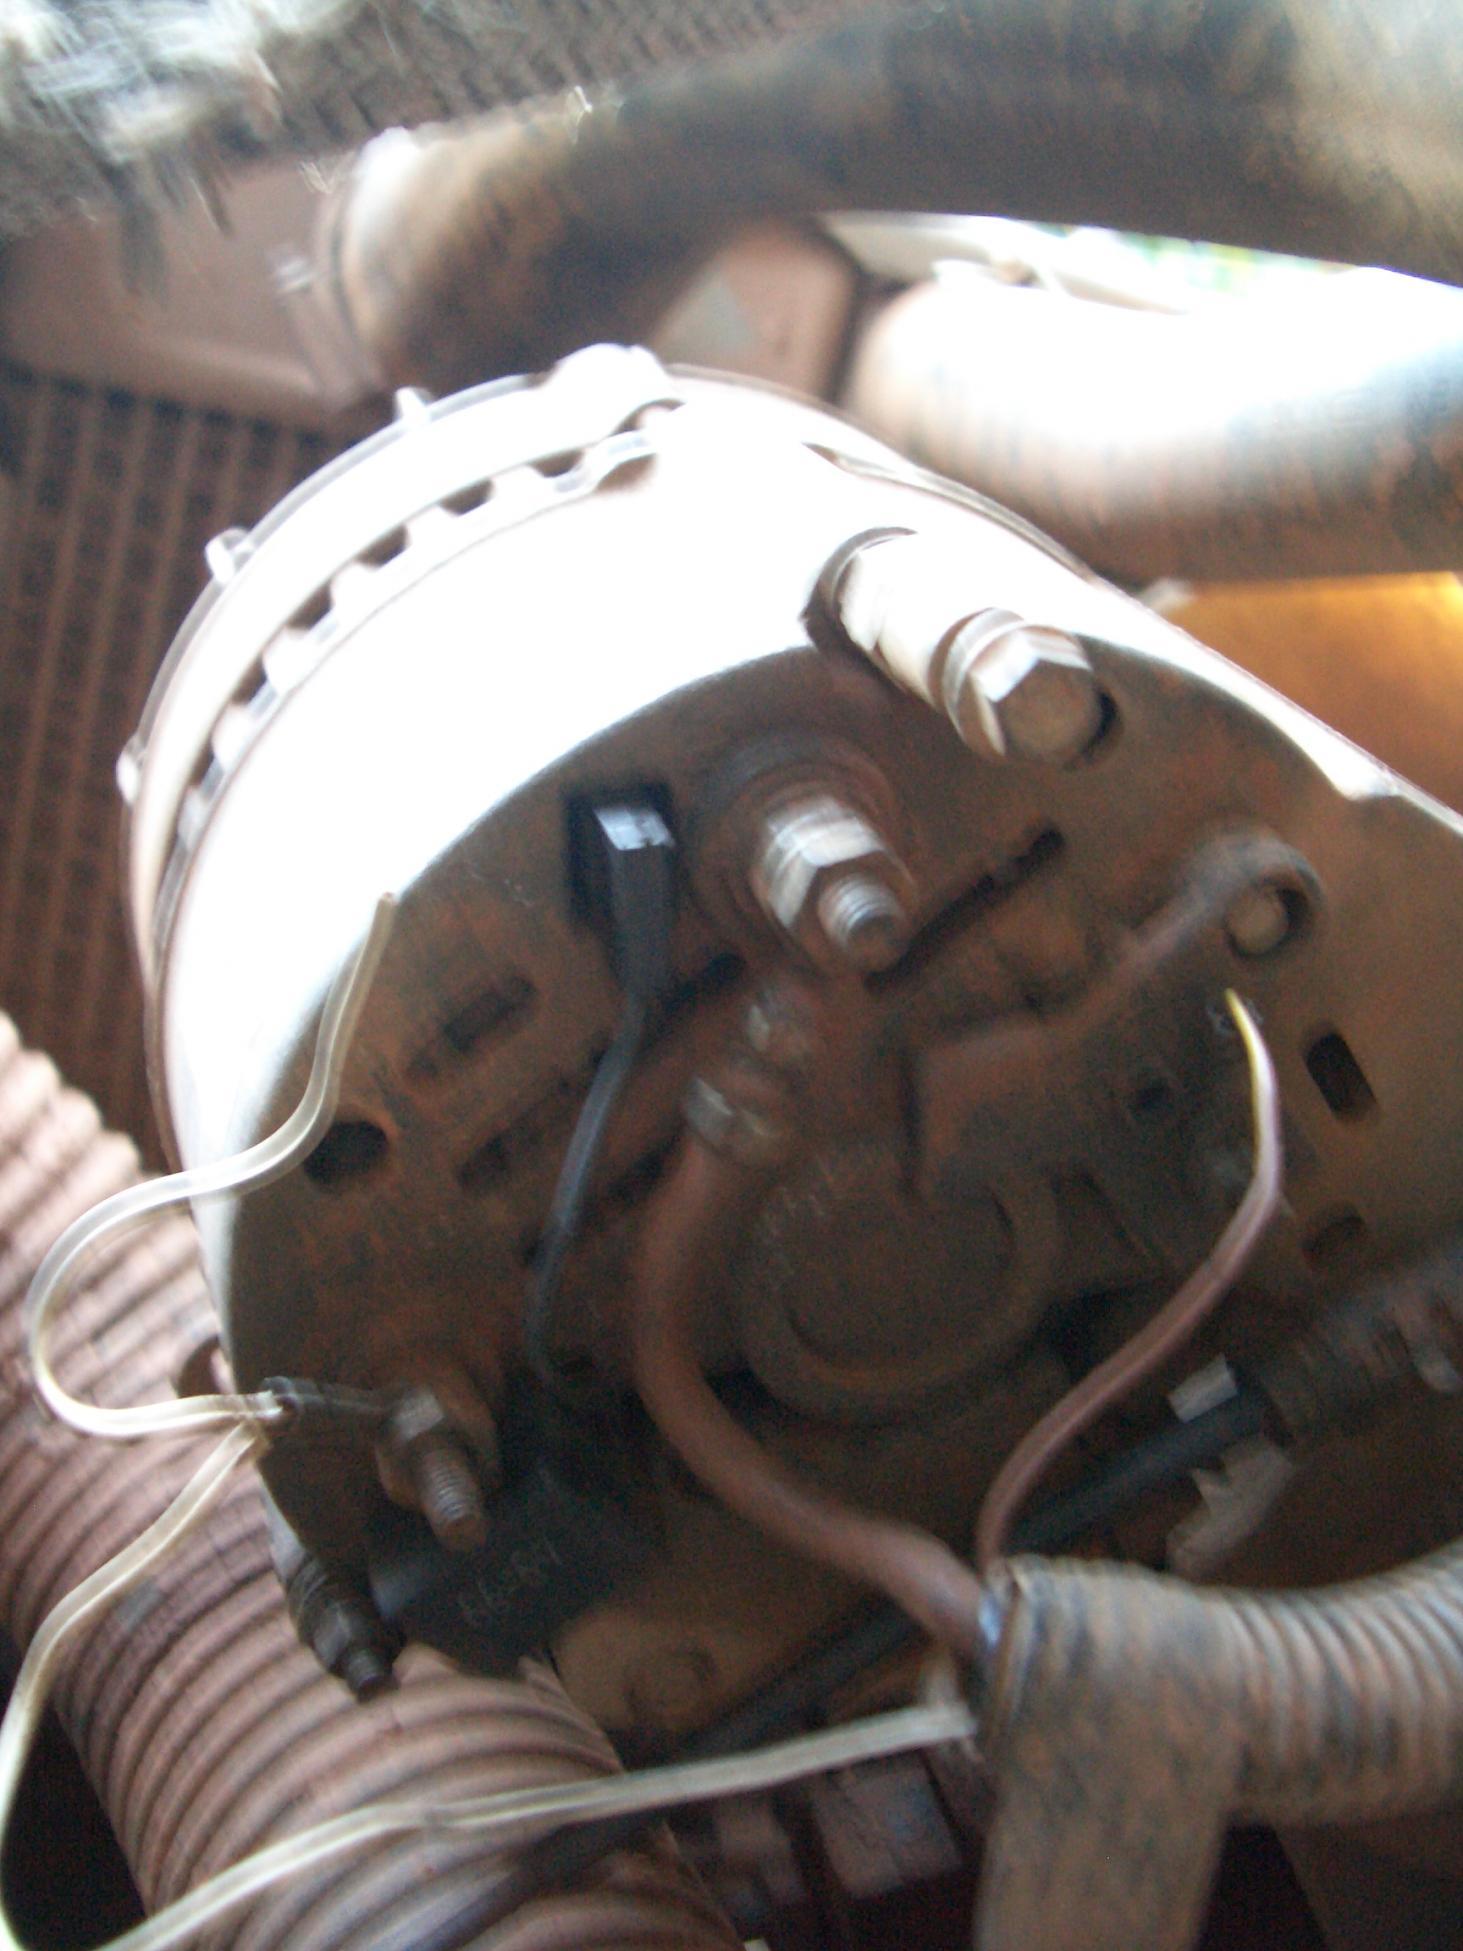 alternator wiring 200 tdi – Land Rover Discovery Alternator Wiring